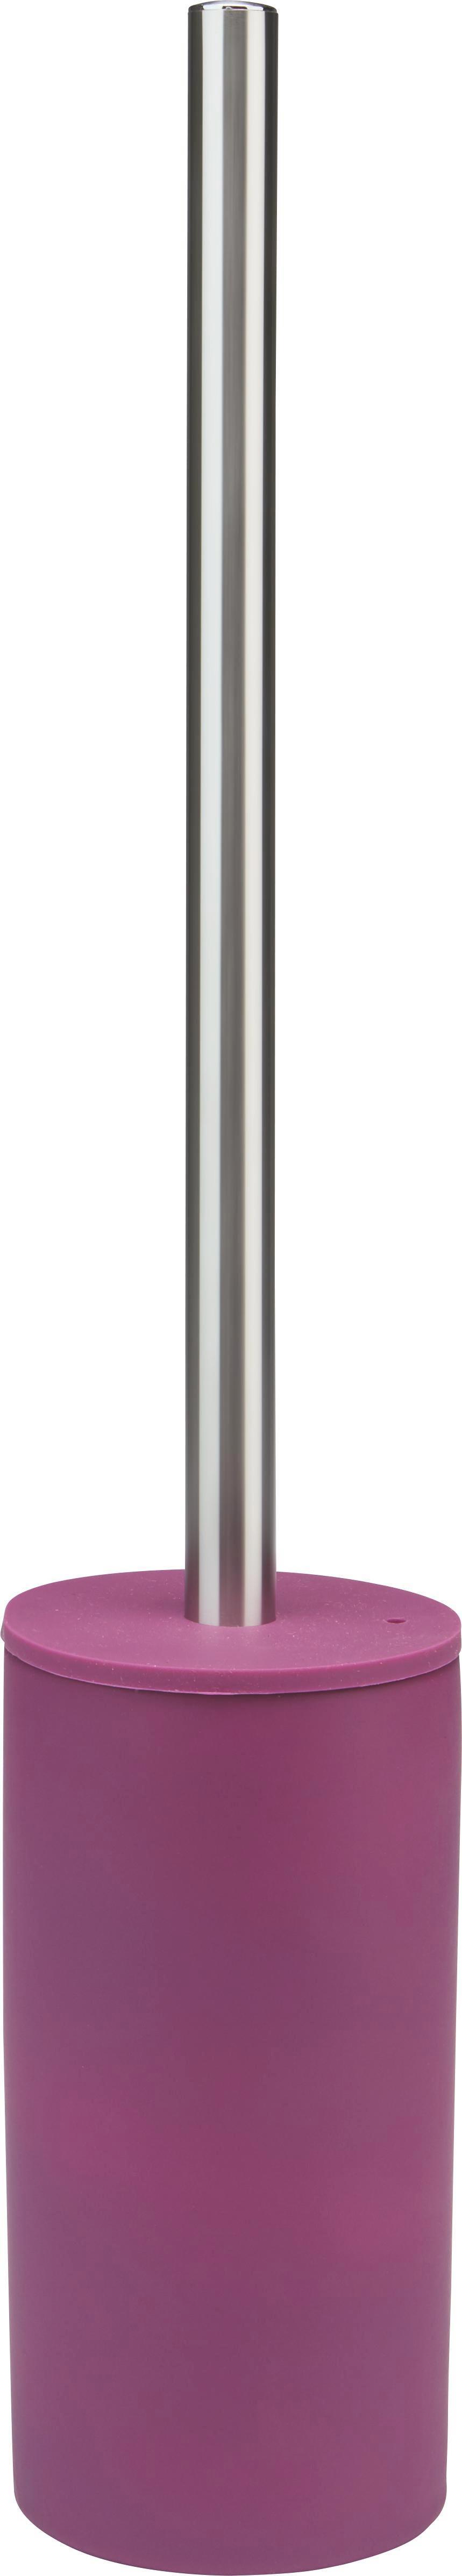 Wc-kefe Melanie - lila, konvencionális, műanyag/fém (8/45cm) - MÖMAX modern living